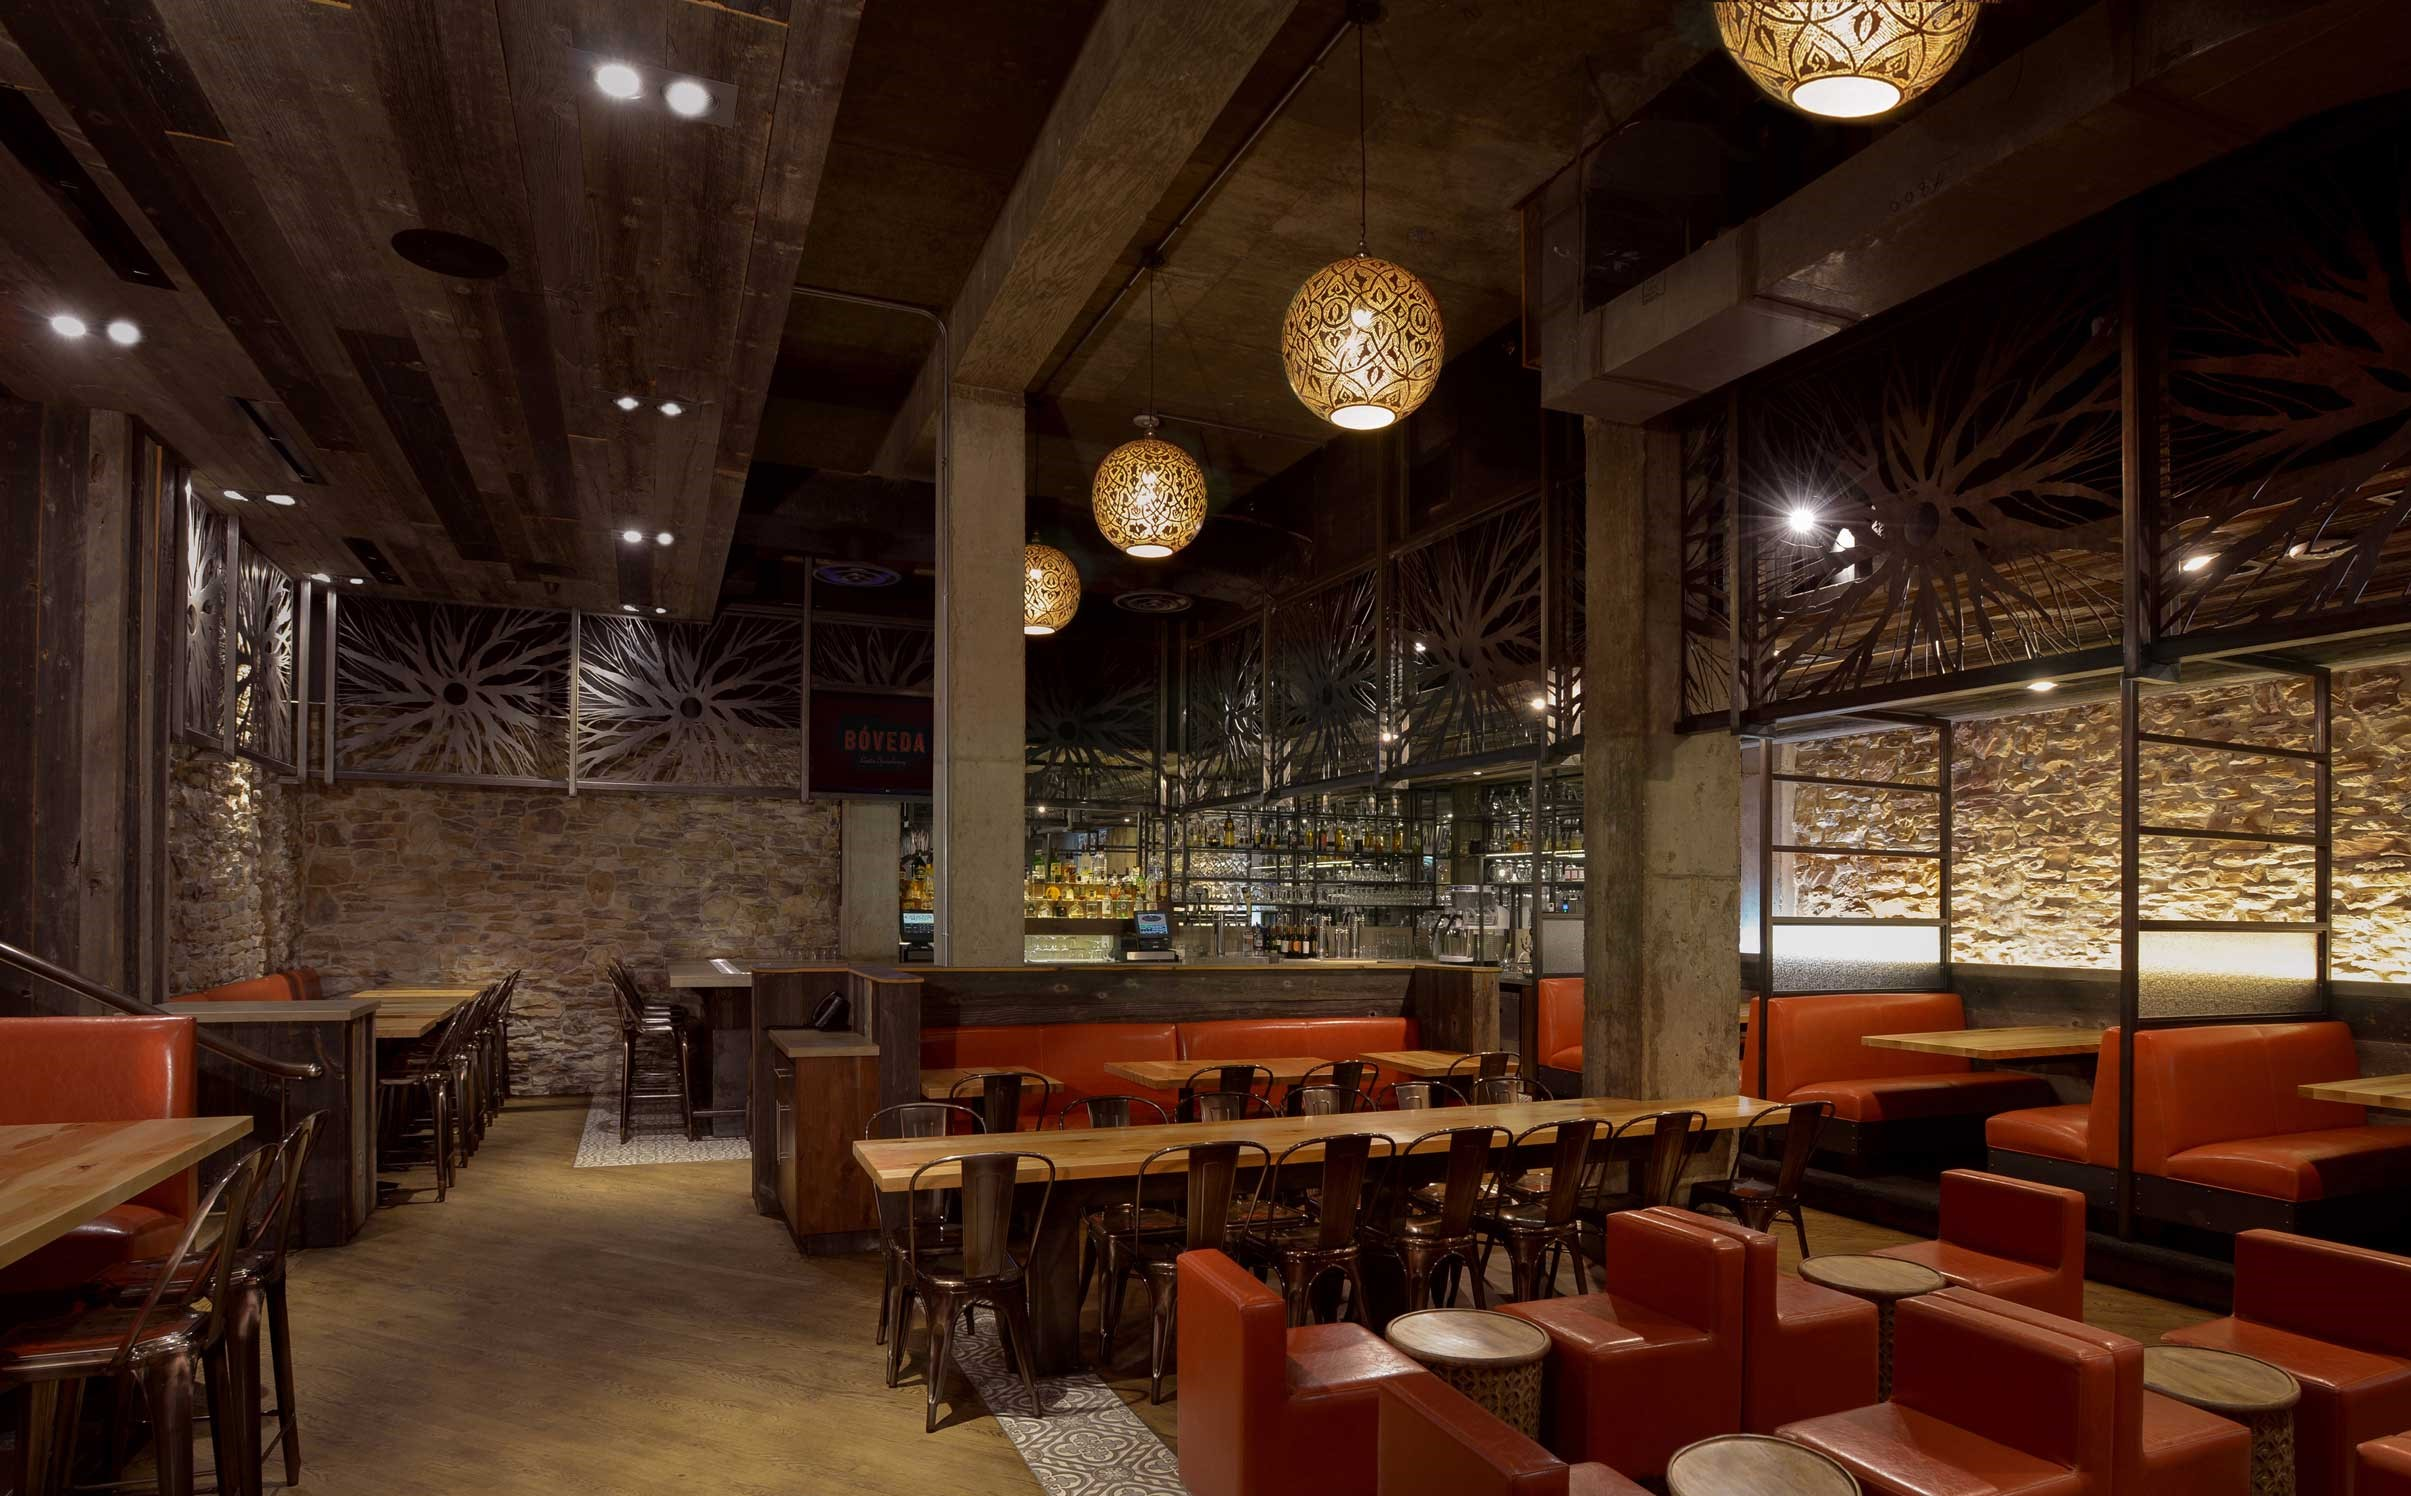 studio-saint-bars-and-restaurants-boveda-washington-dc-2